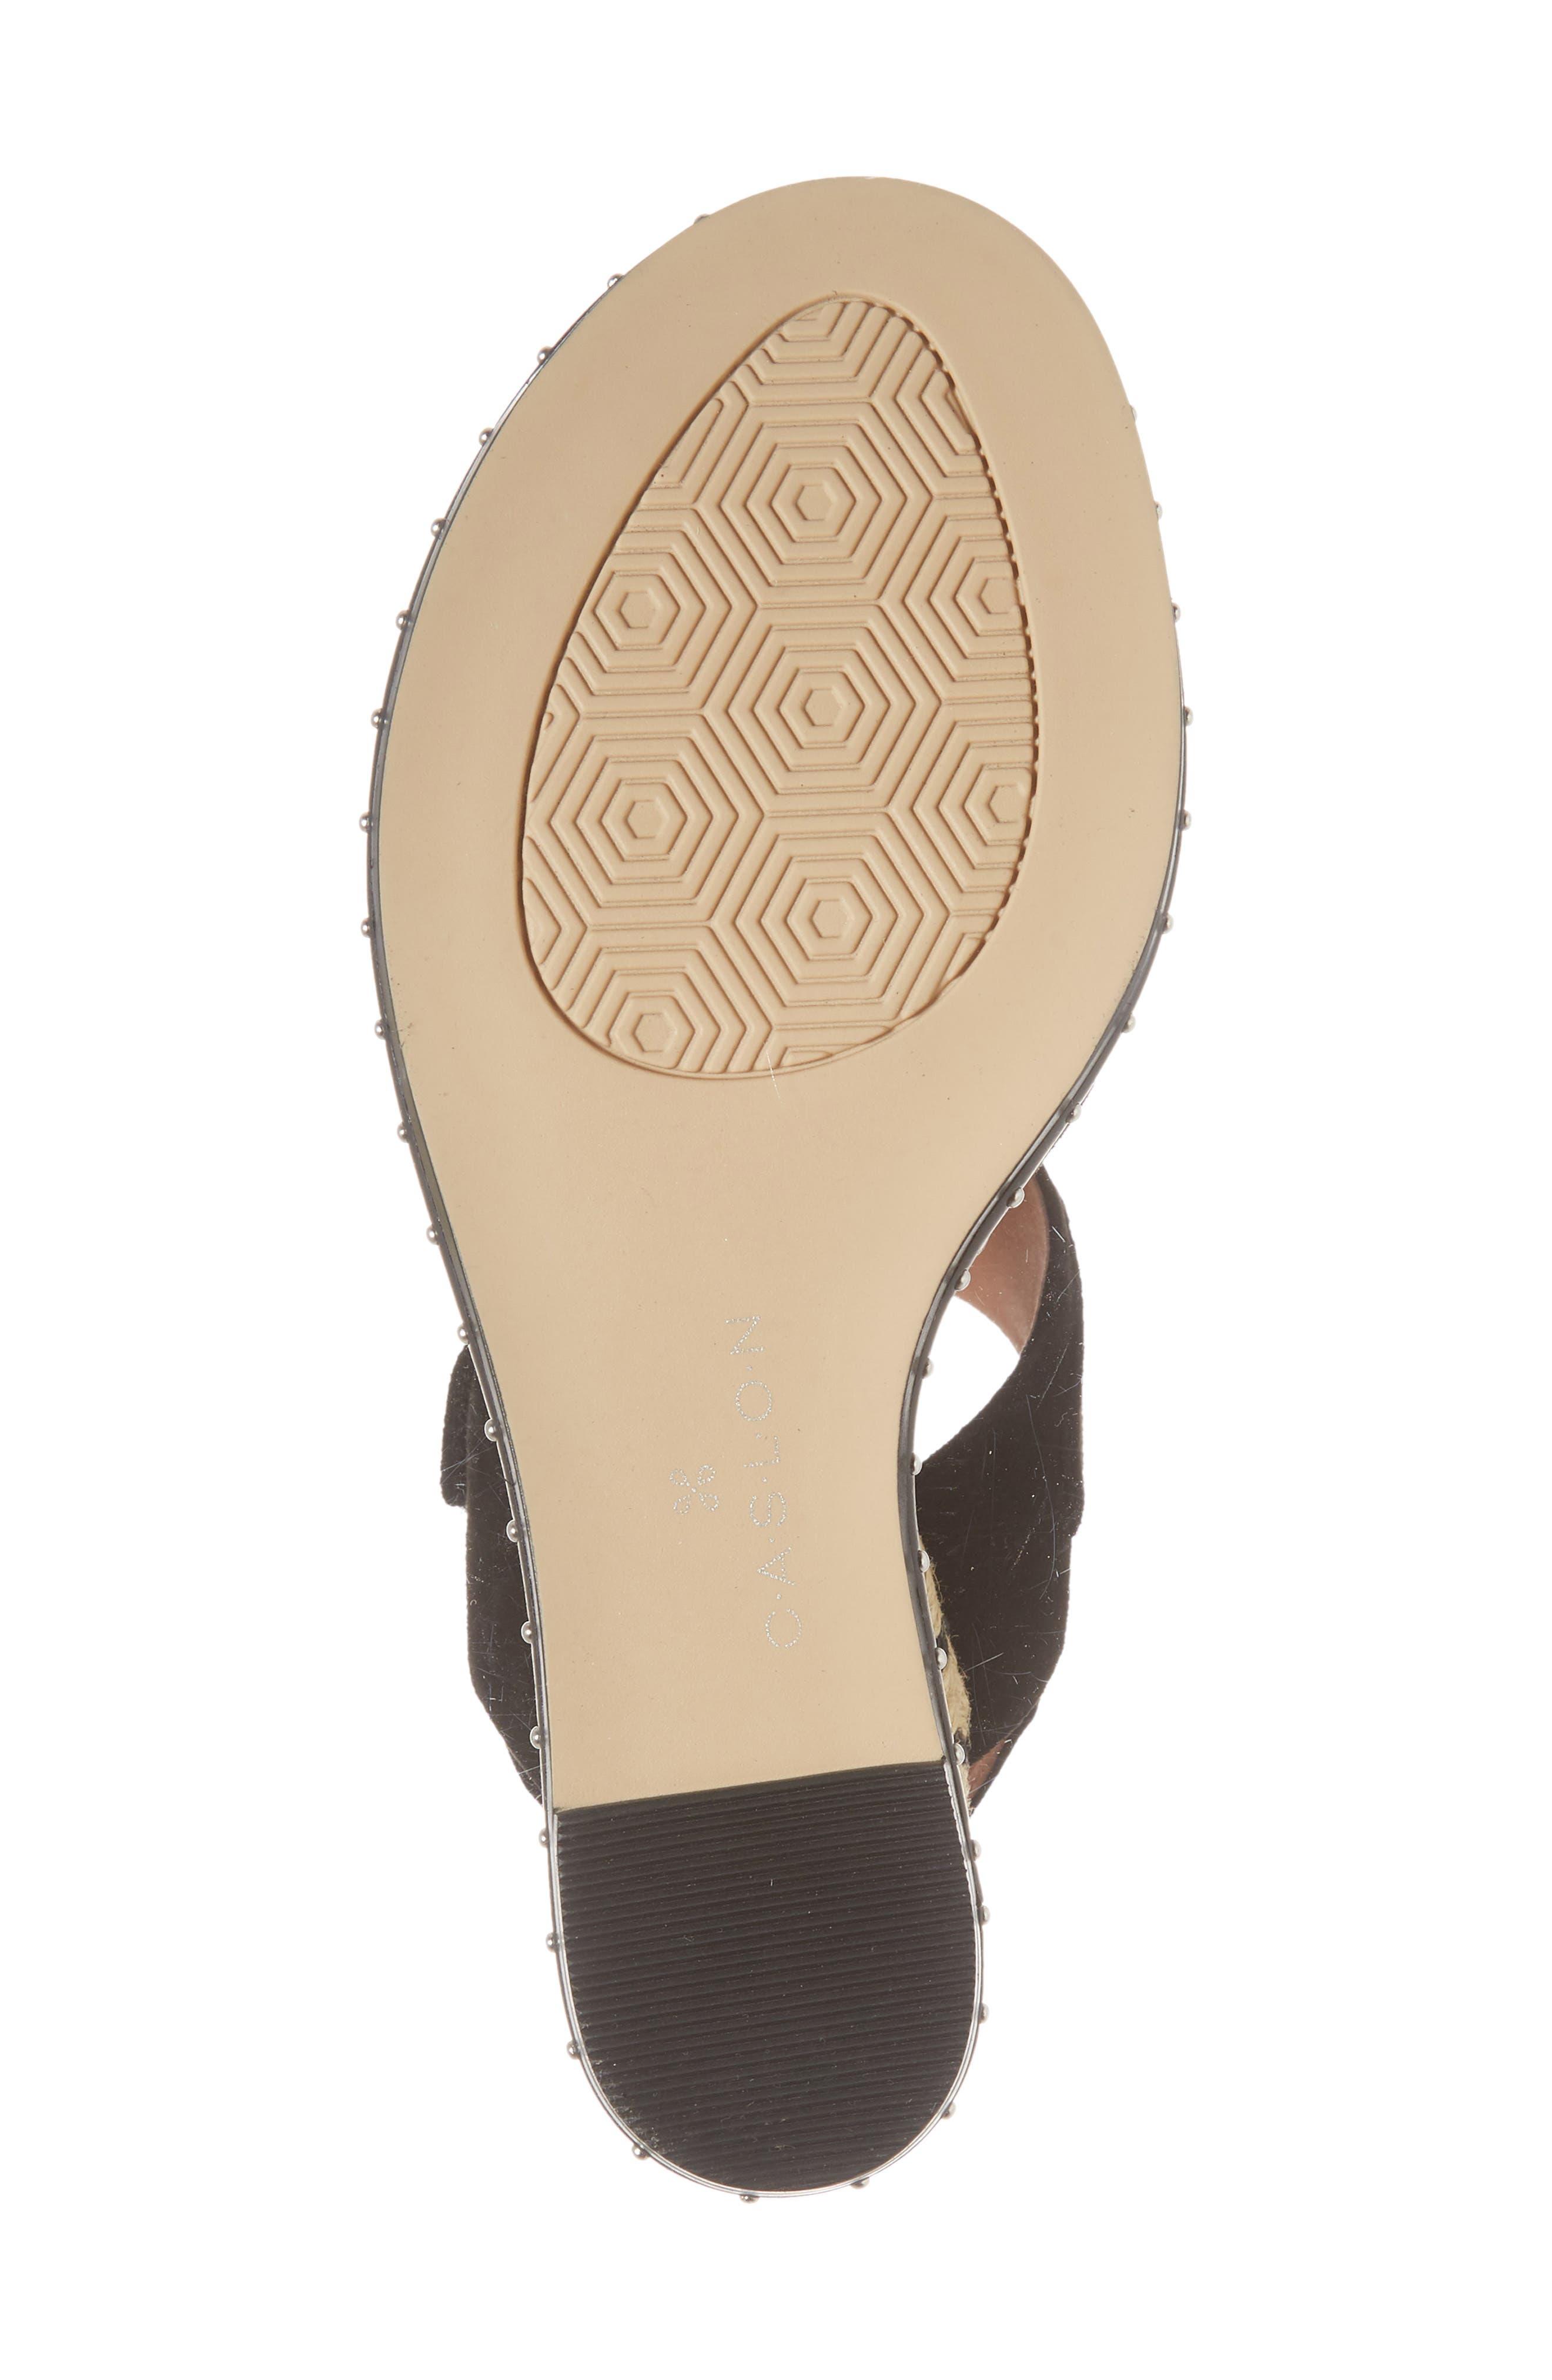 Braxton Platform Wedge Sandal,                             Alternate thumbnail 6, color,                             001